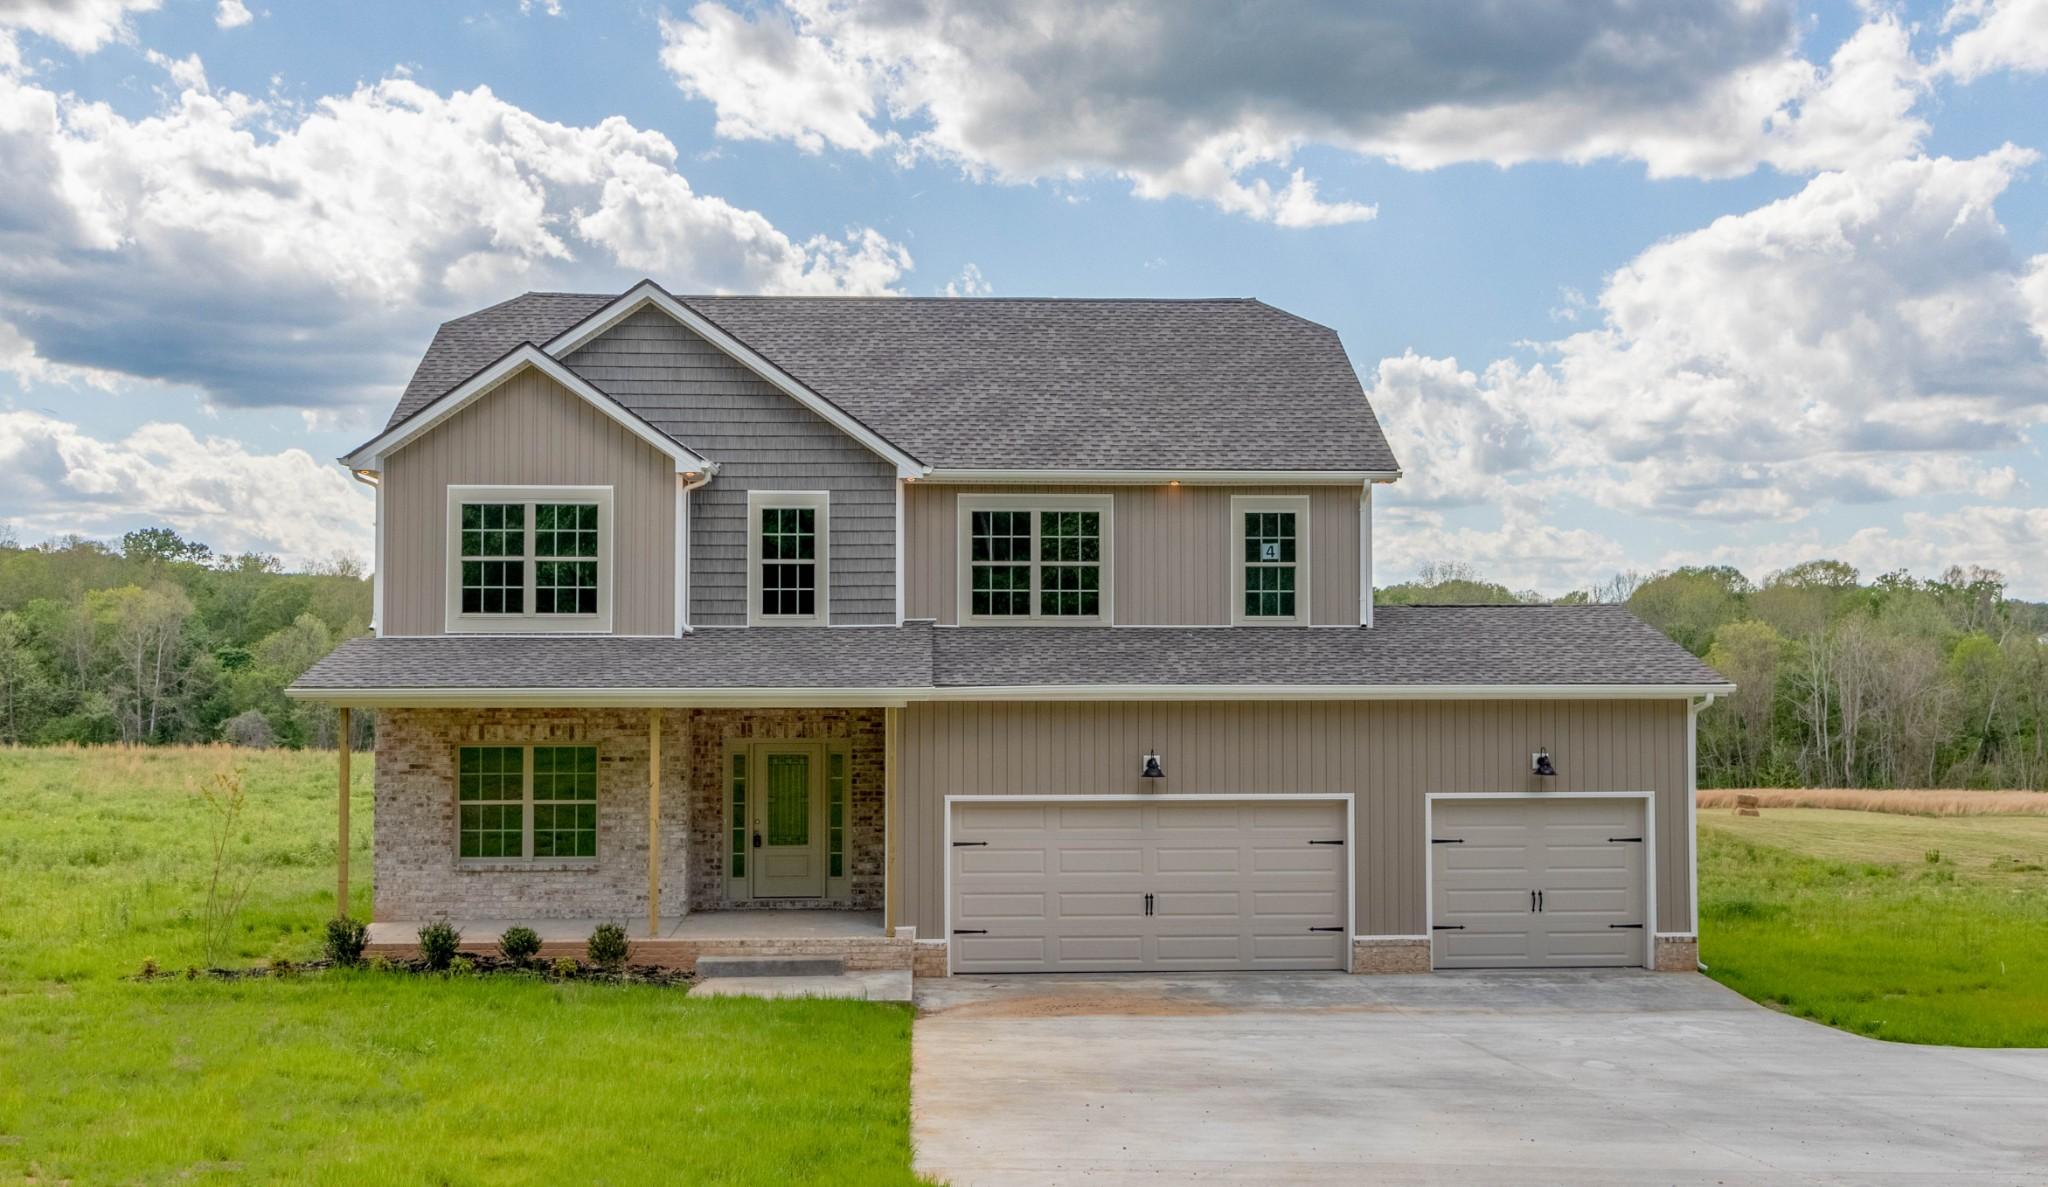 3380 Old Highway 48, Clarksville, TN 37040 - Clarksville, TN real estate listing